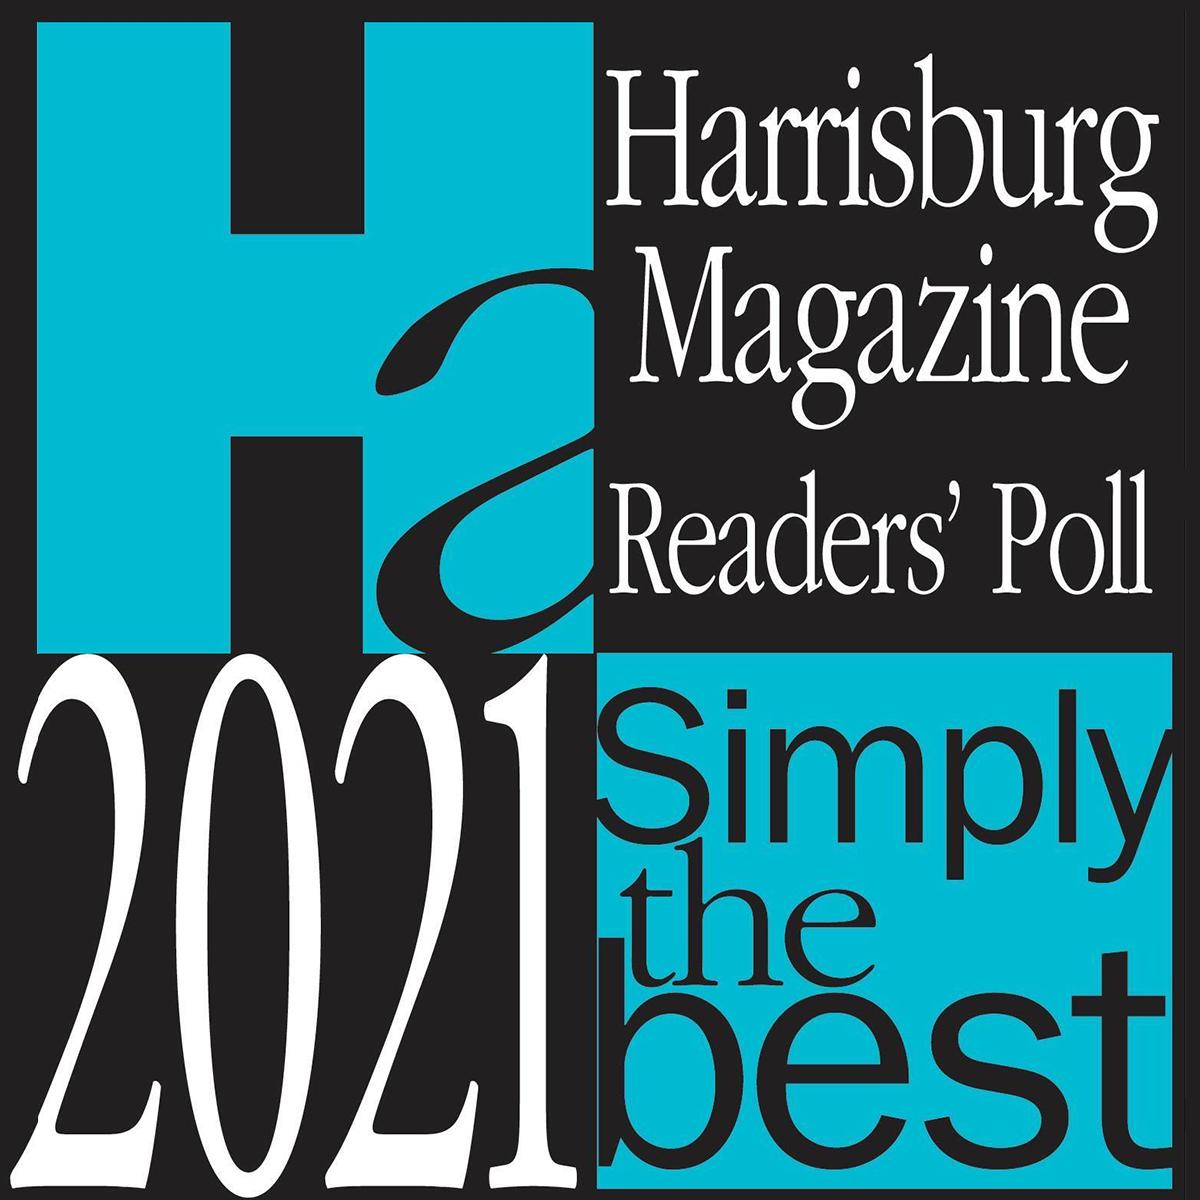 Readers Choice 2021 Award